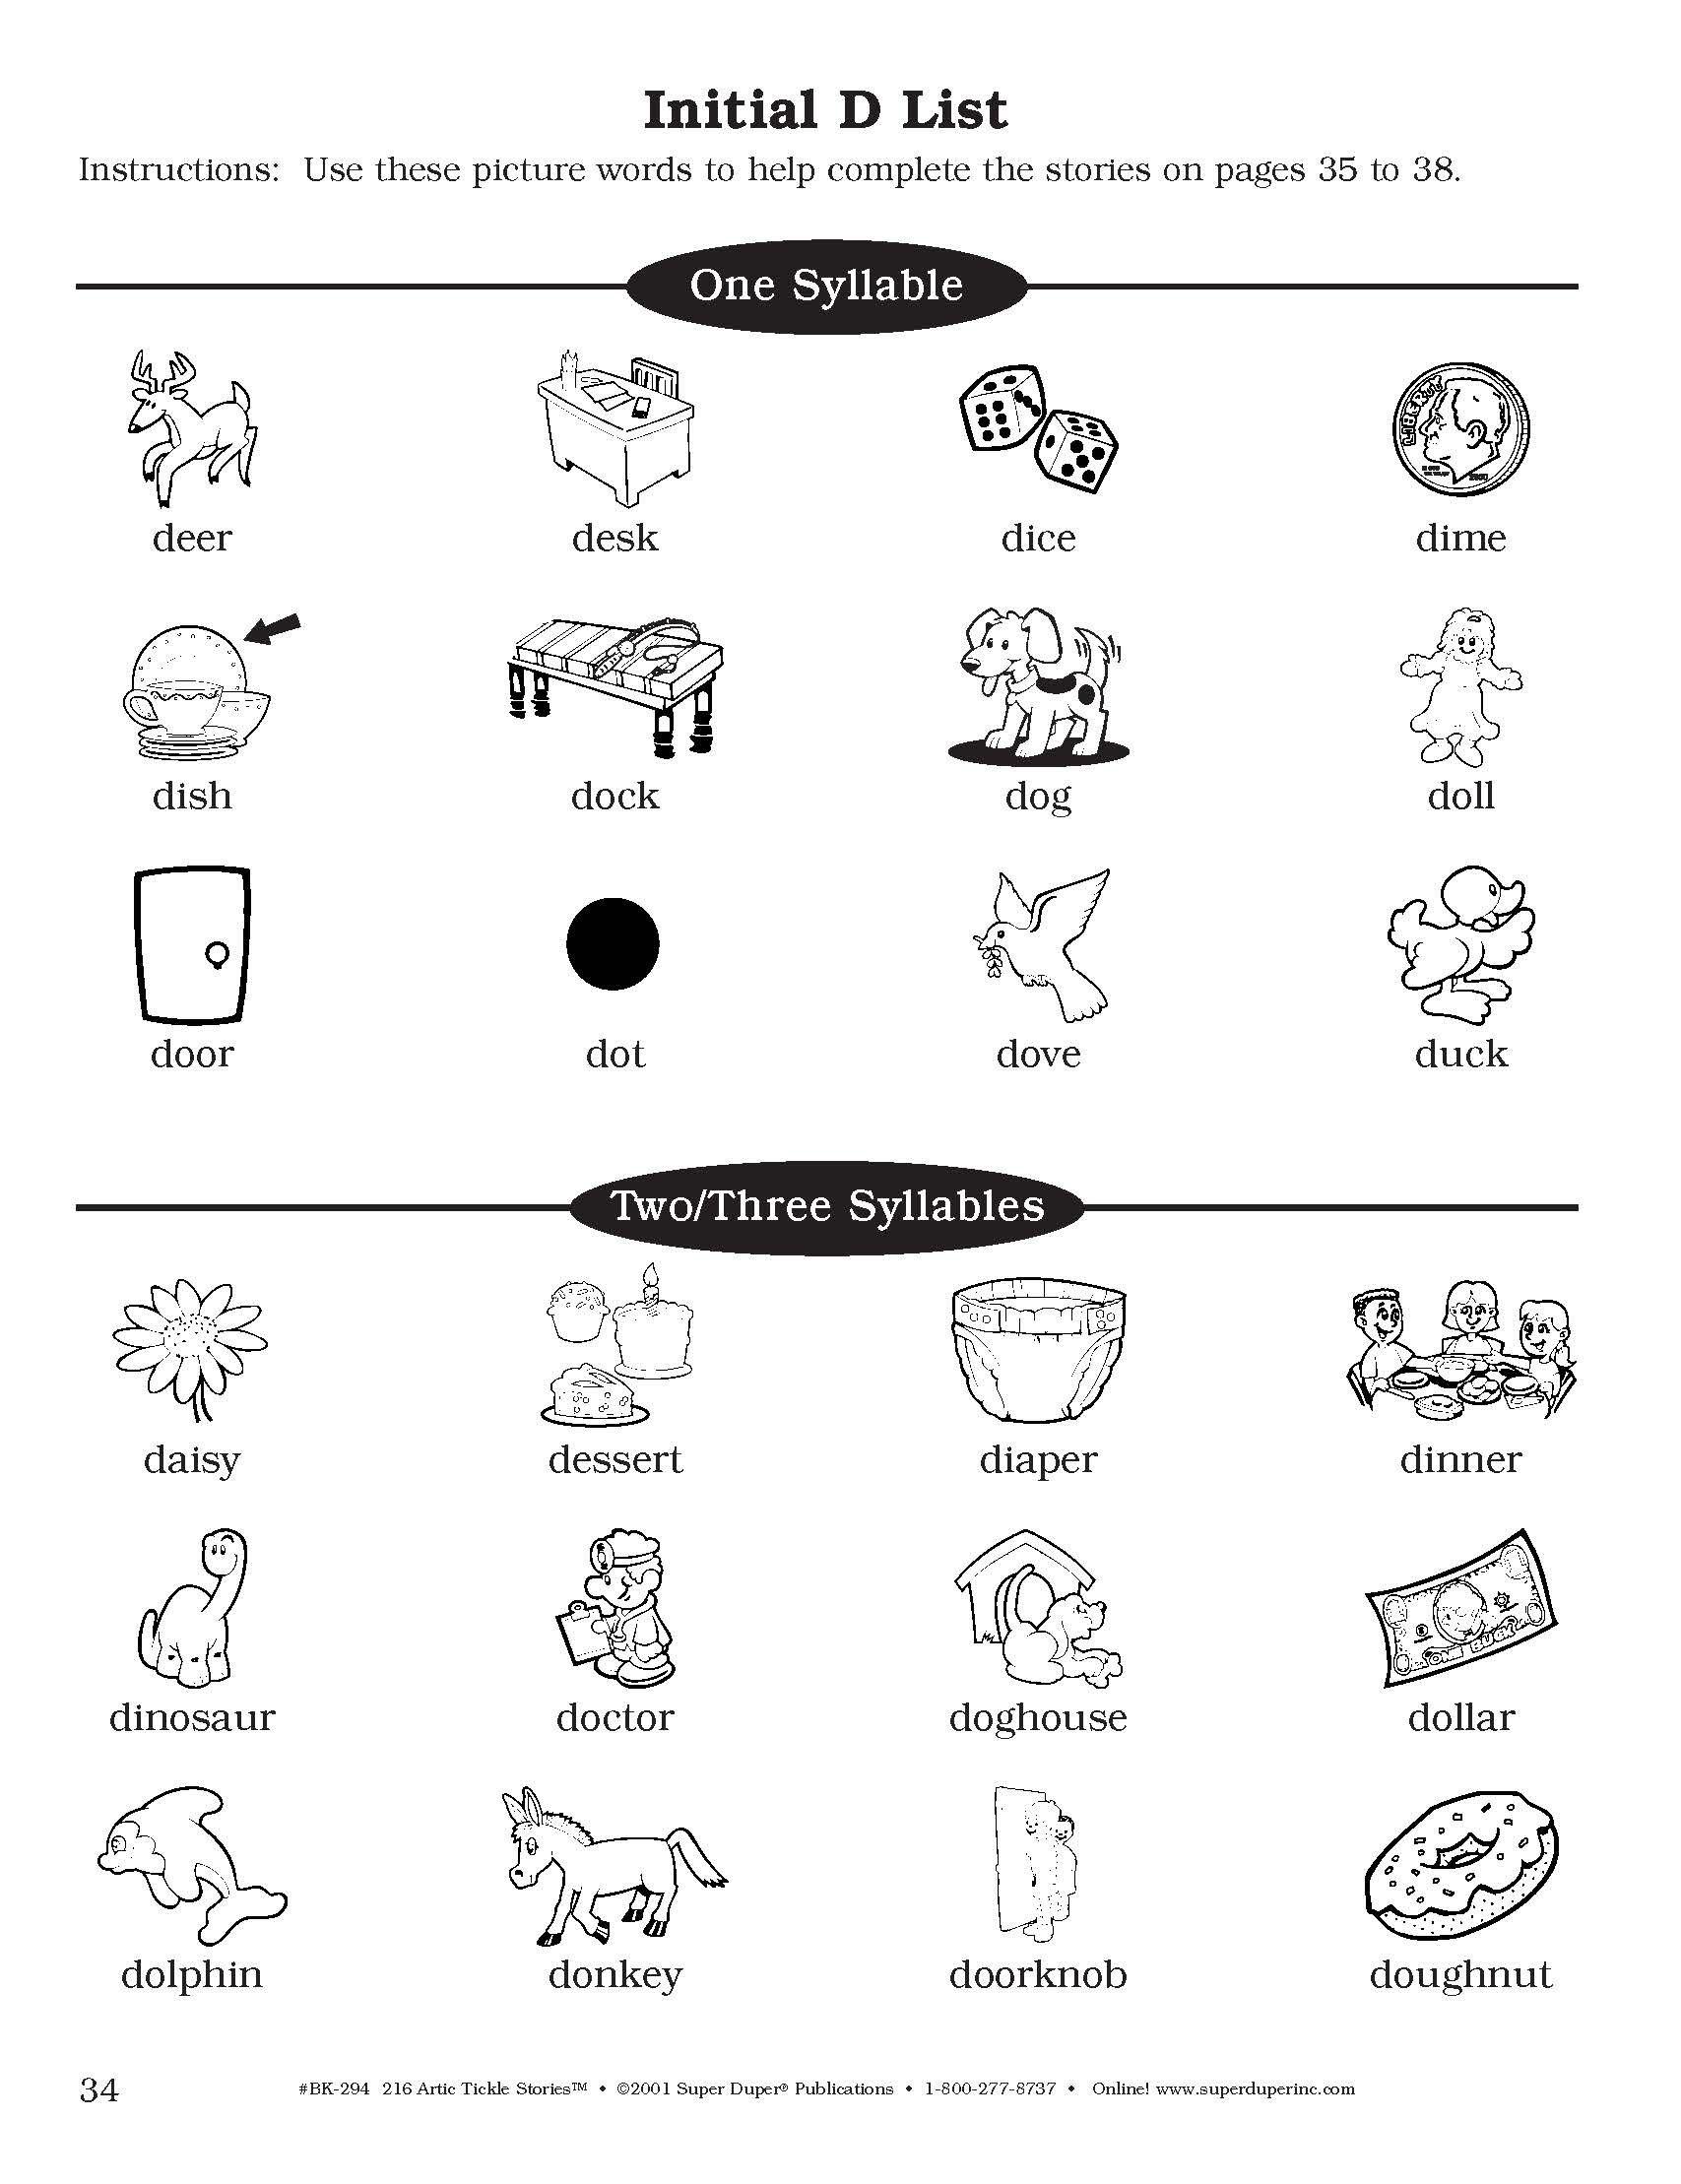 Initial D Sound Fun Sheet